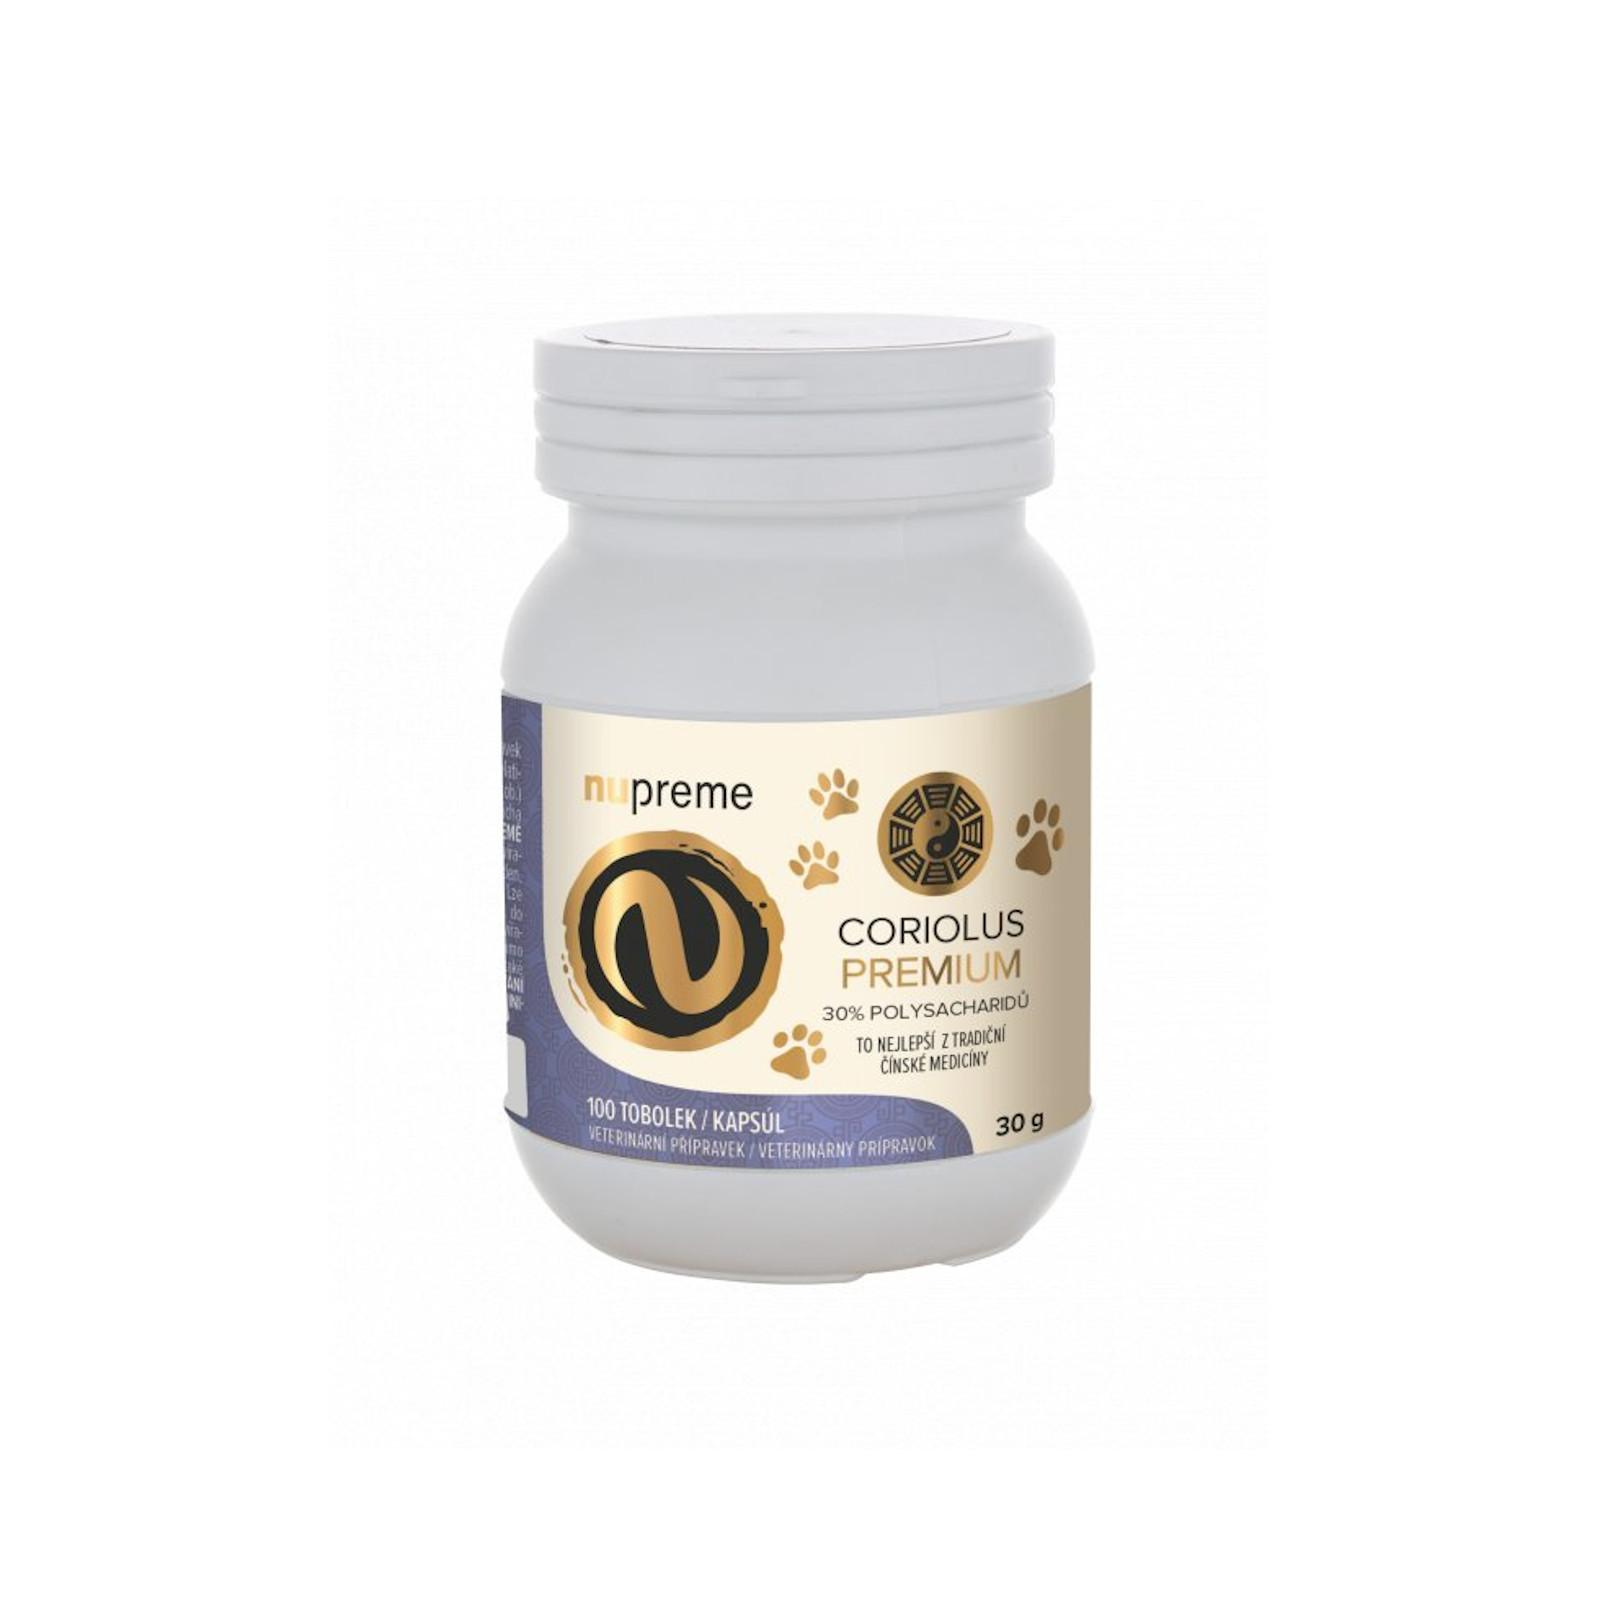 Nupreme Coriolus Versicolor premium extrakt, kapsle 100 ks, 30 g